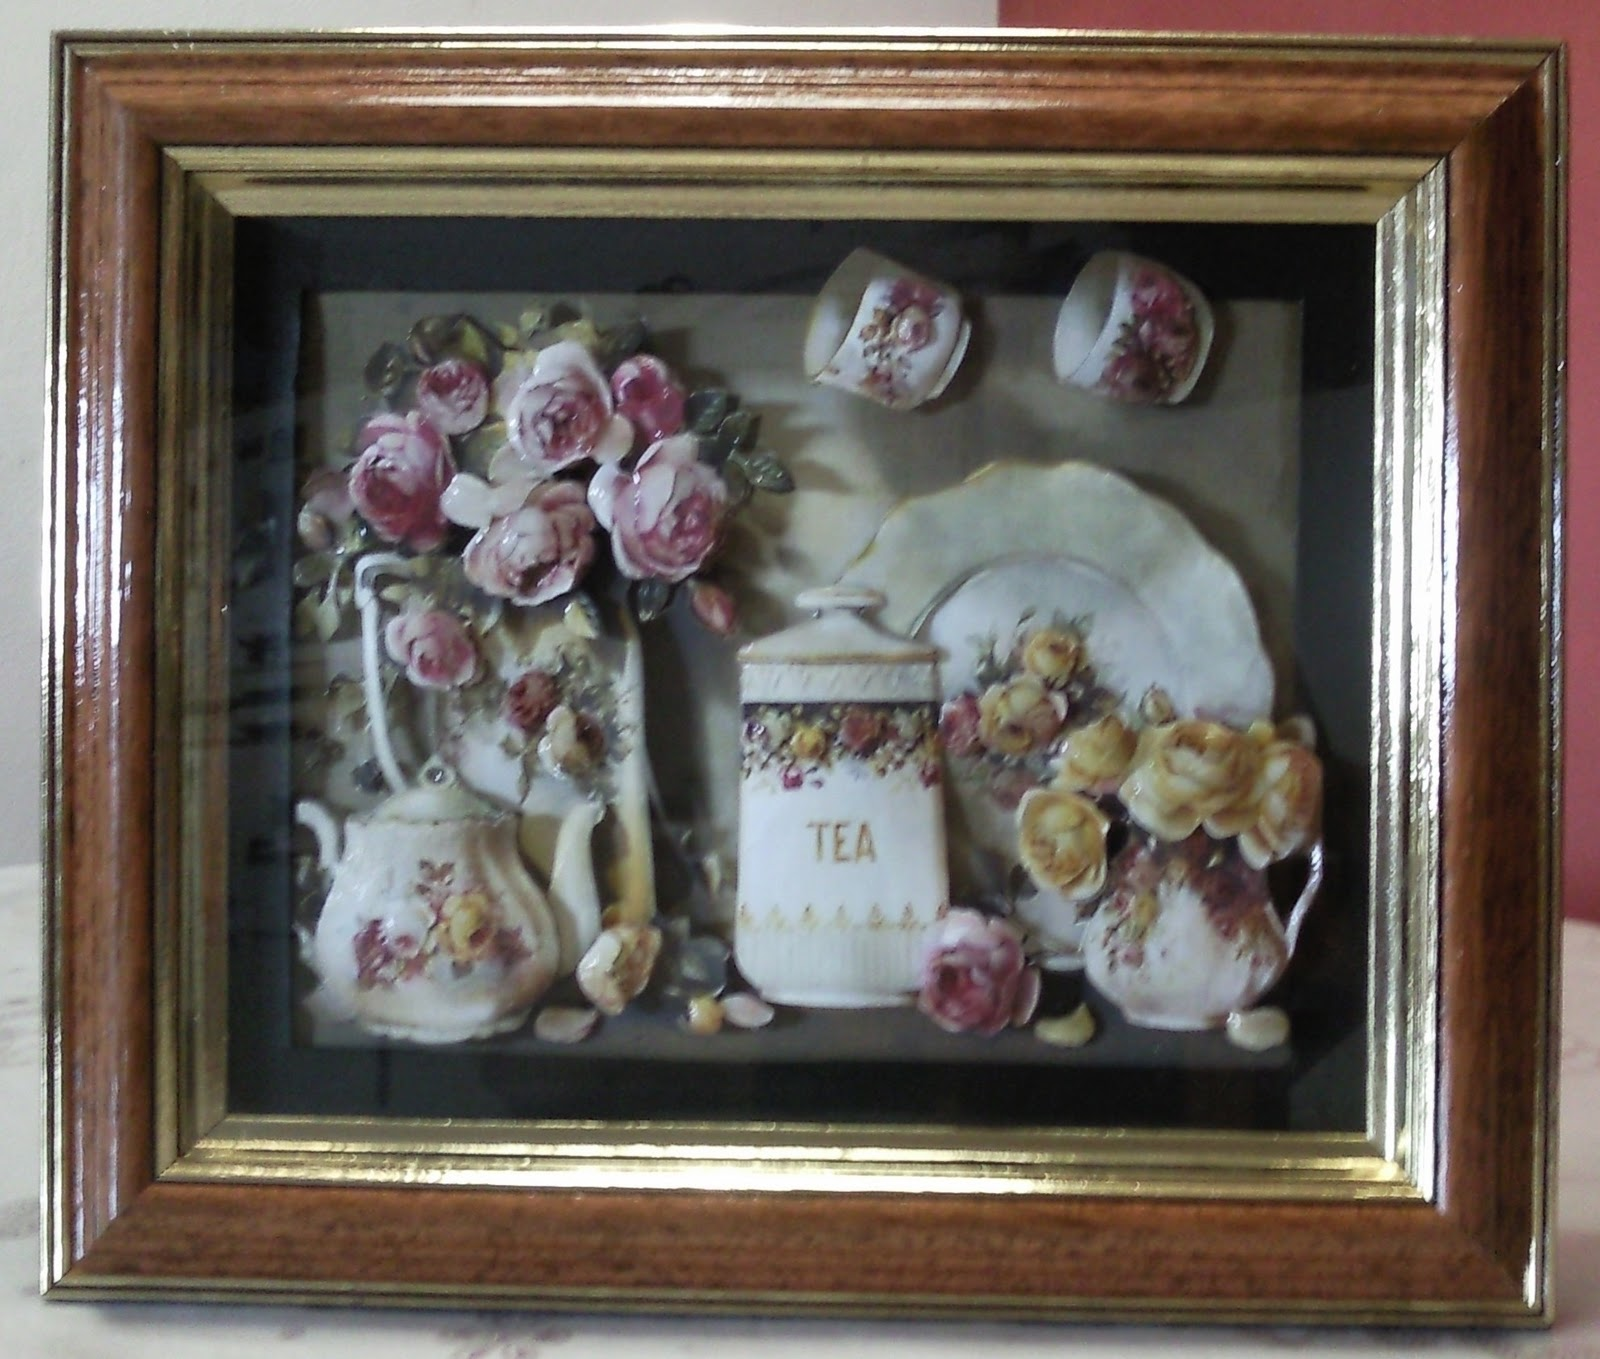 Viky cortes ideas cuadro 35x25 porcelana inglesa con estilo shabby chic - Cuadros shabby chic ...